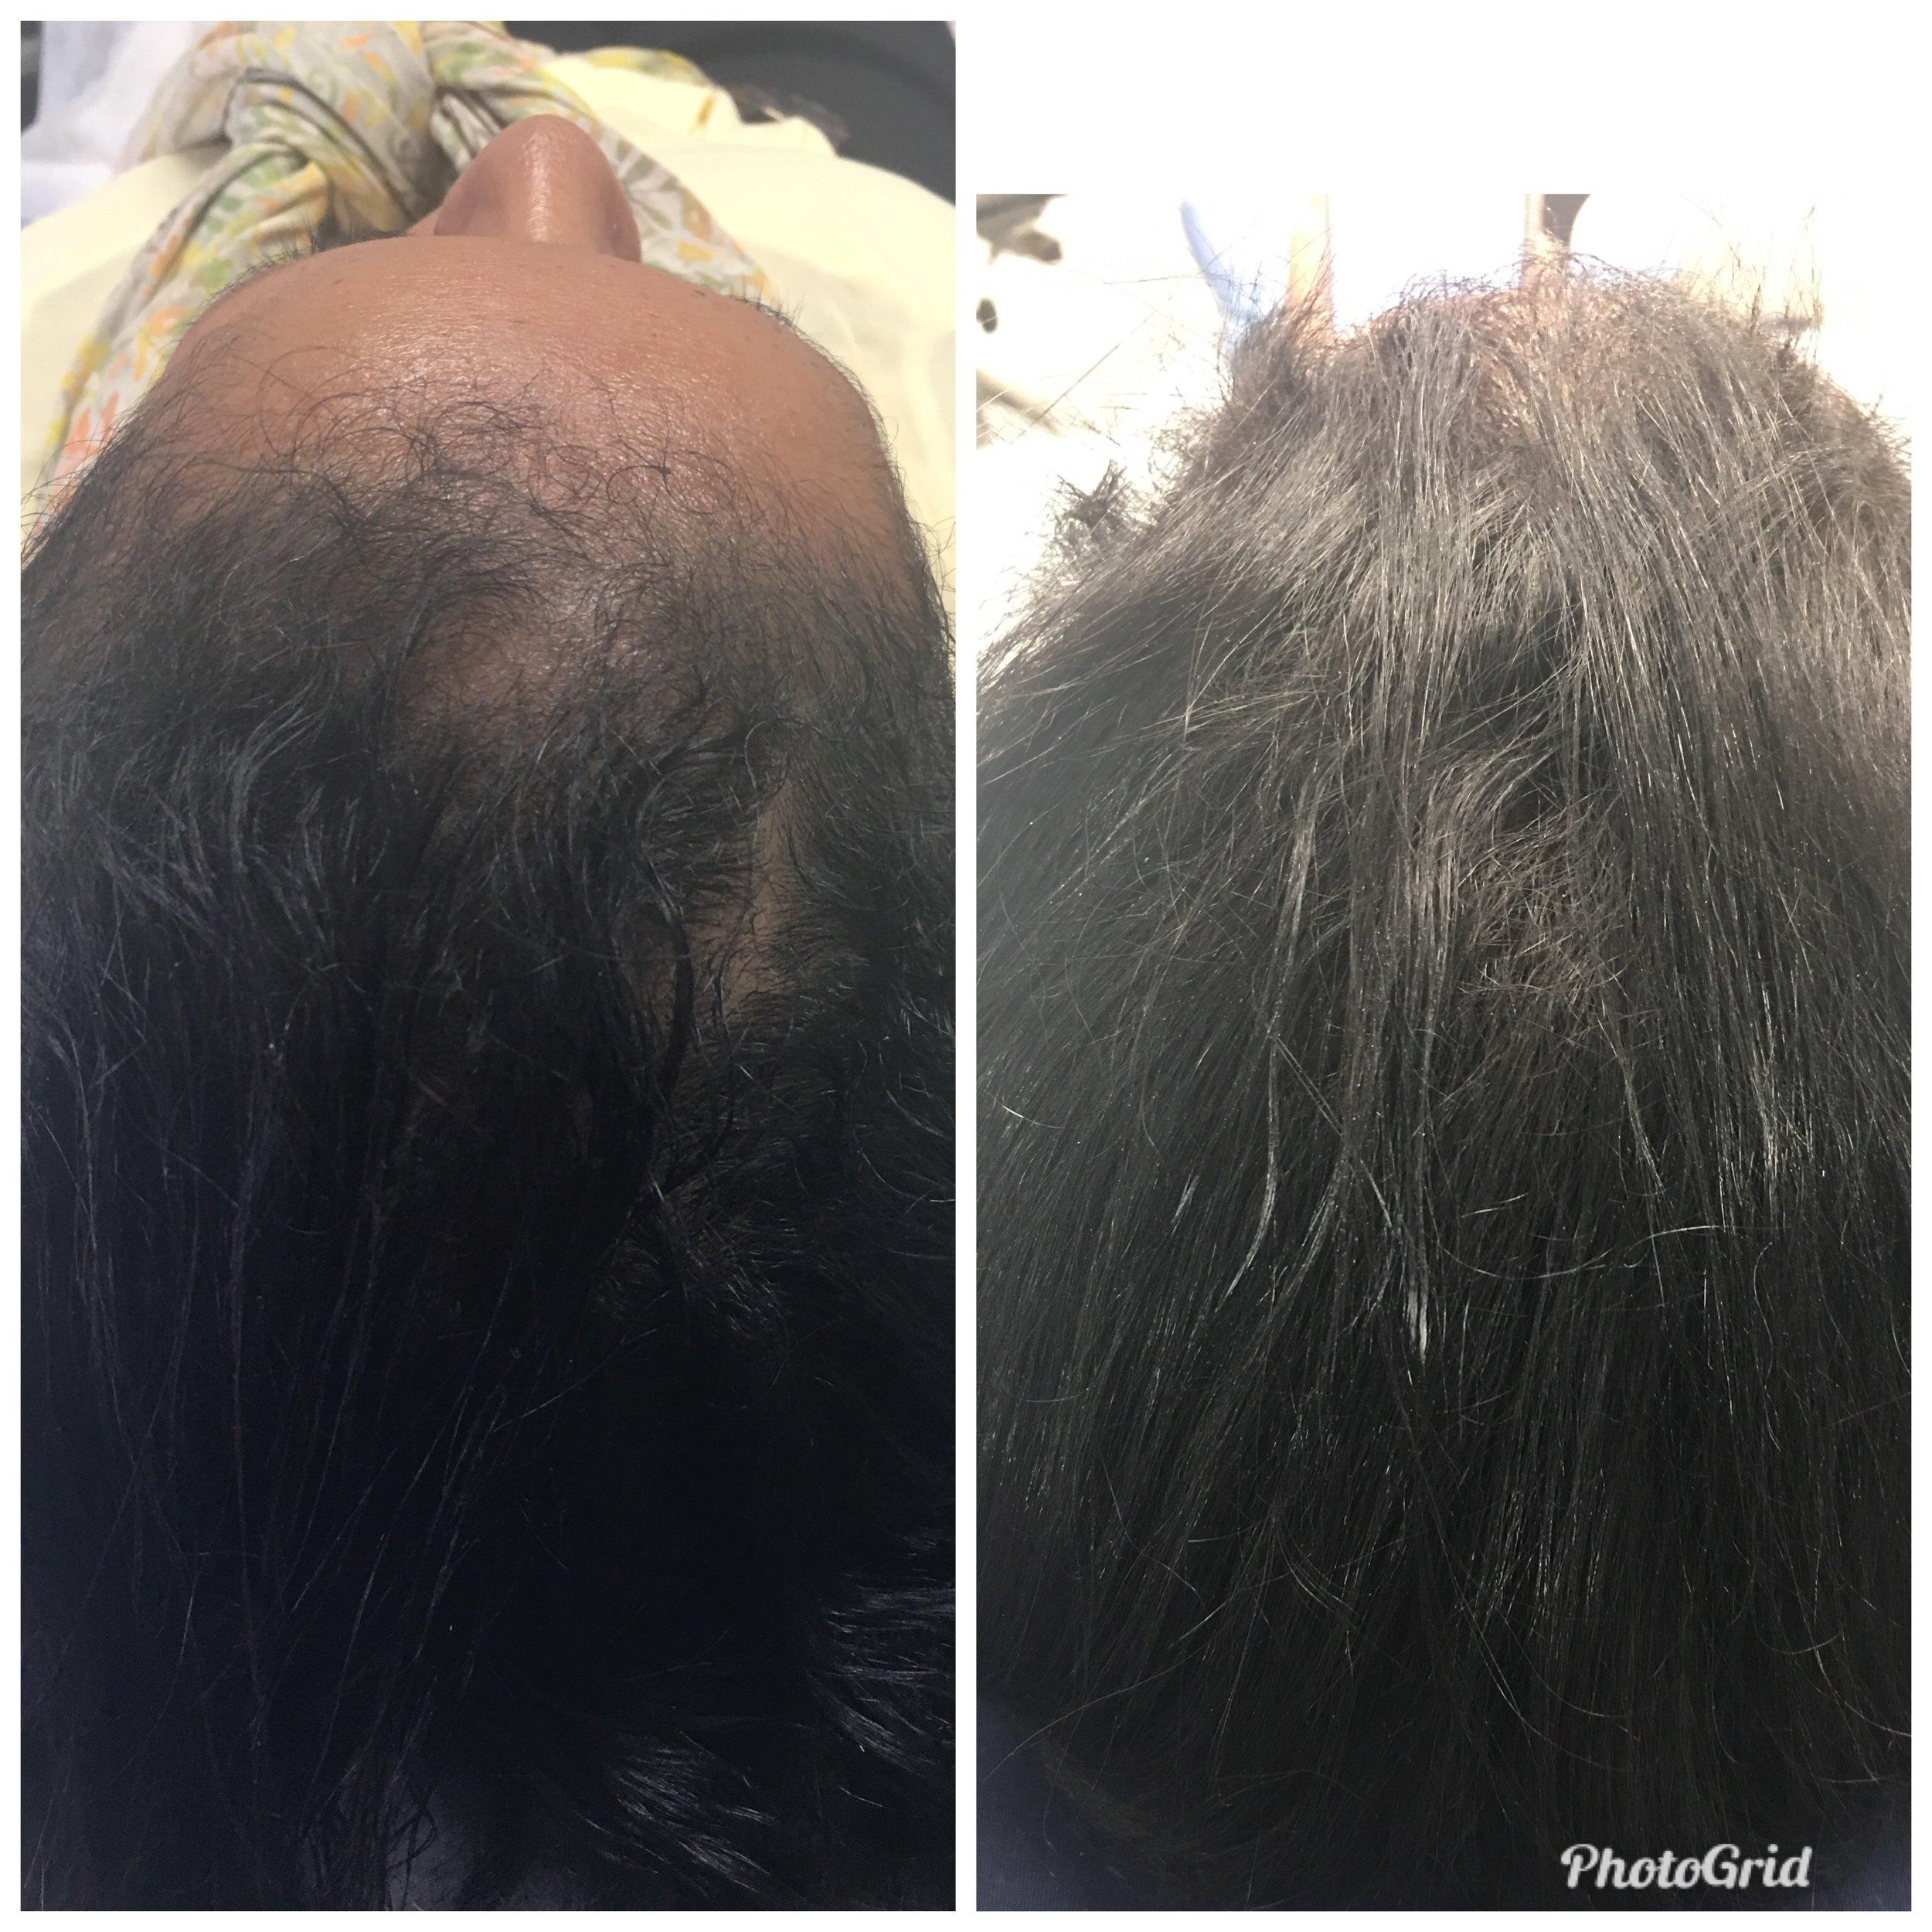 Traction Alopecia Treatment (15 Weeks)